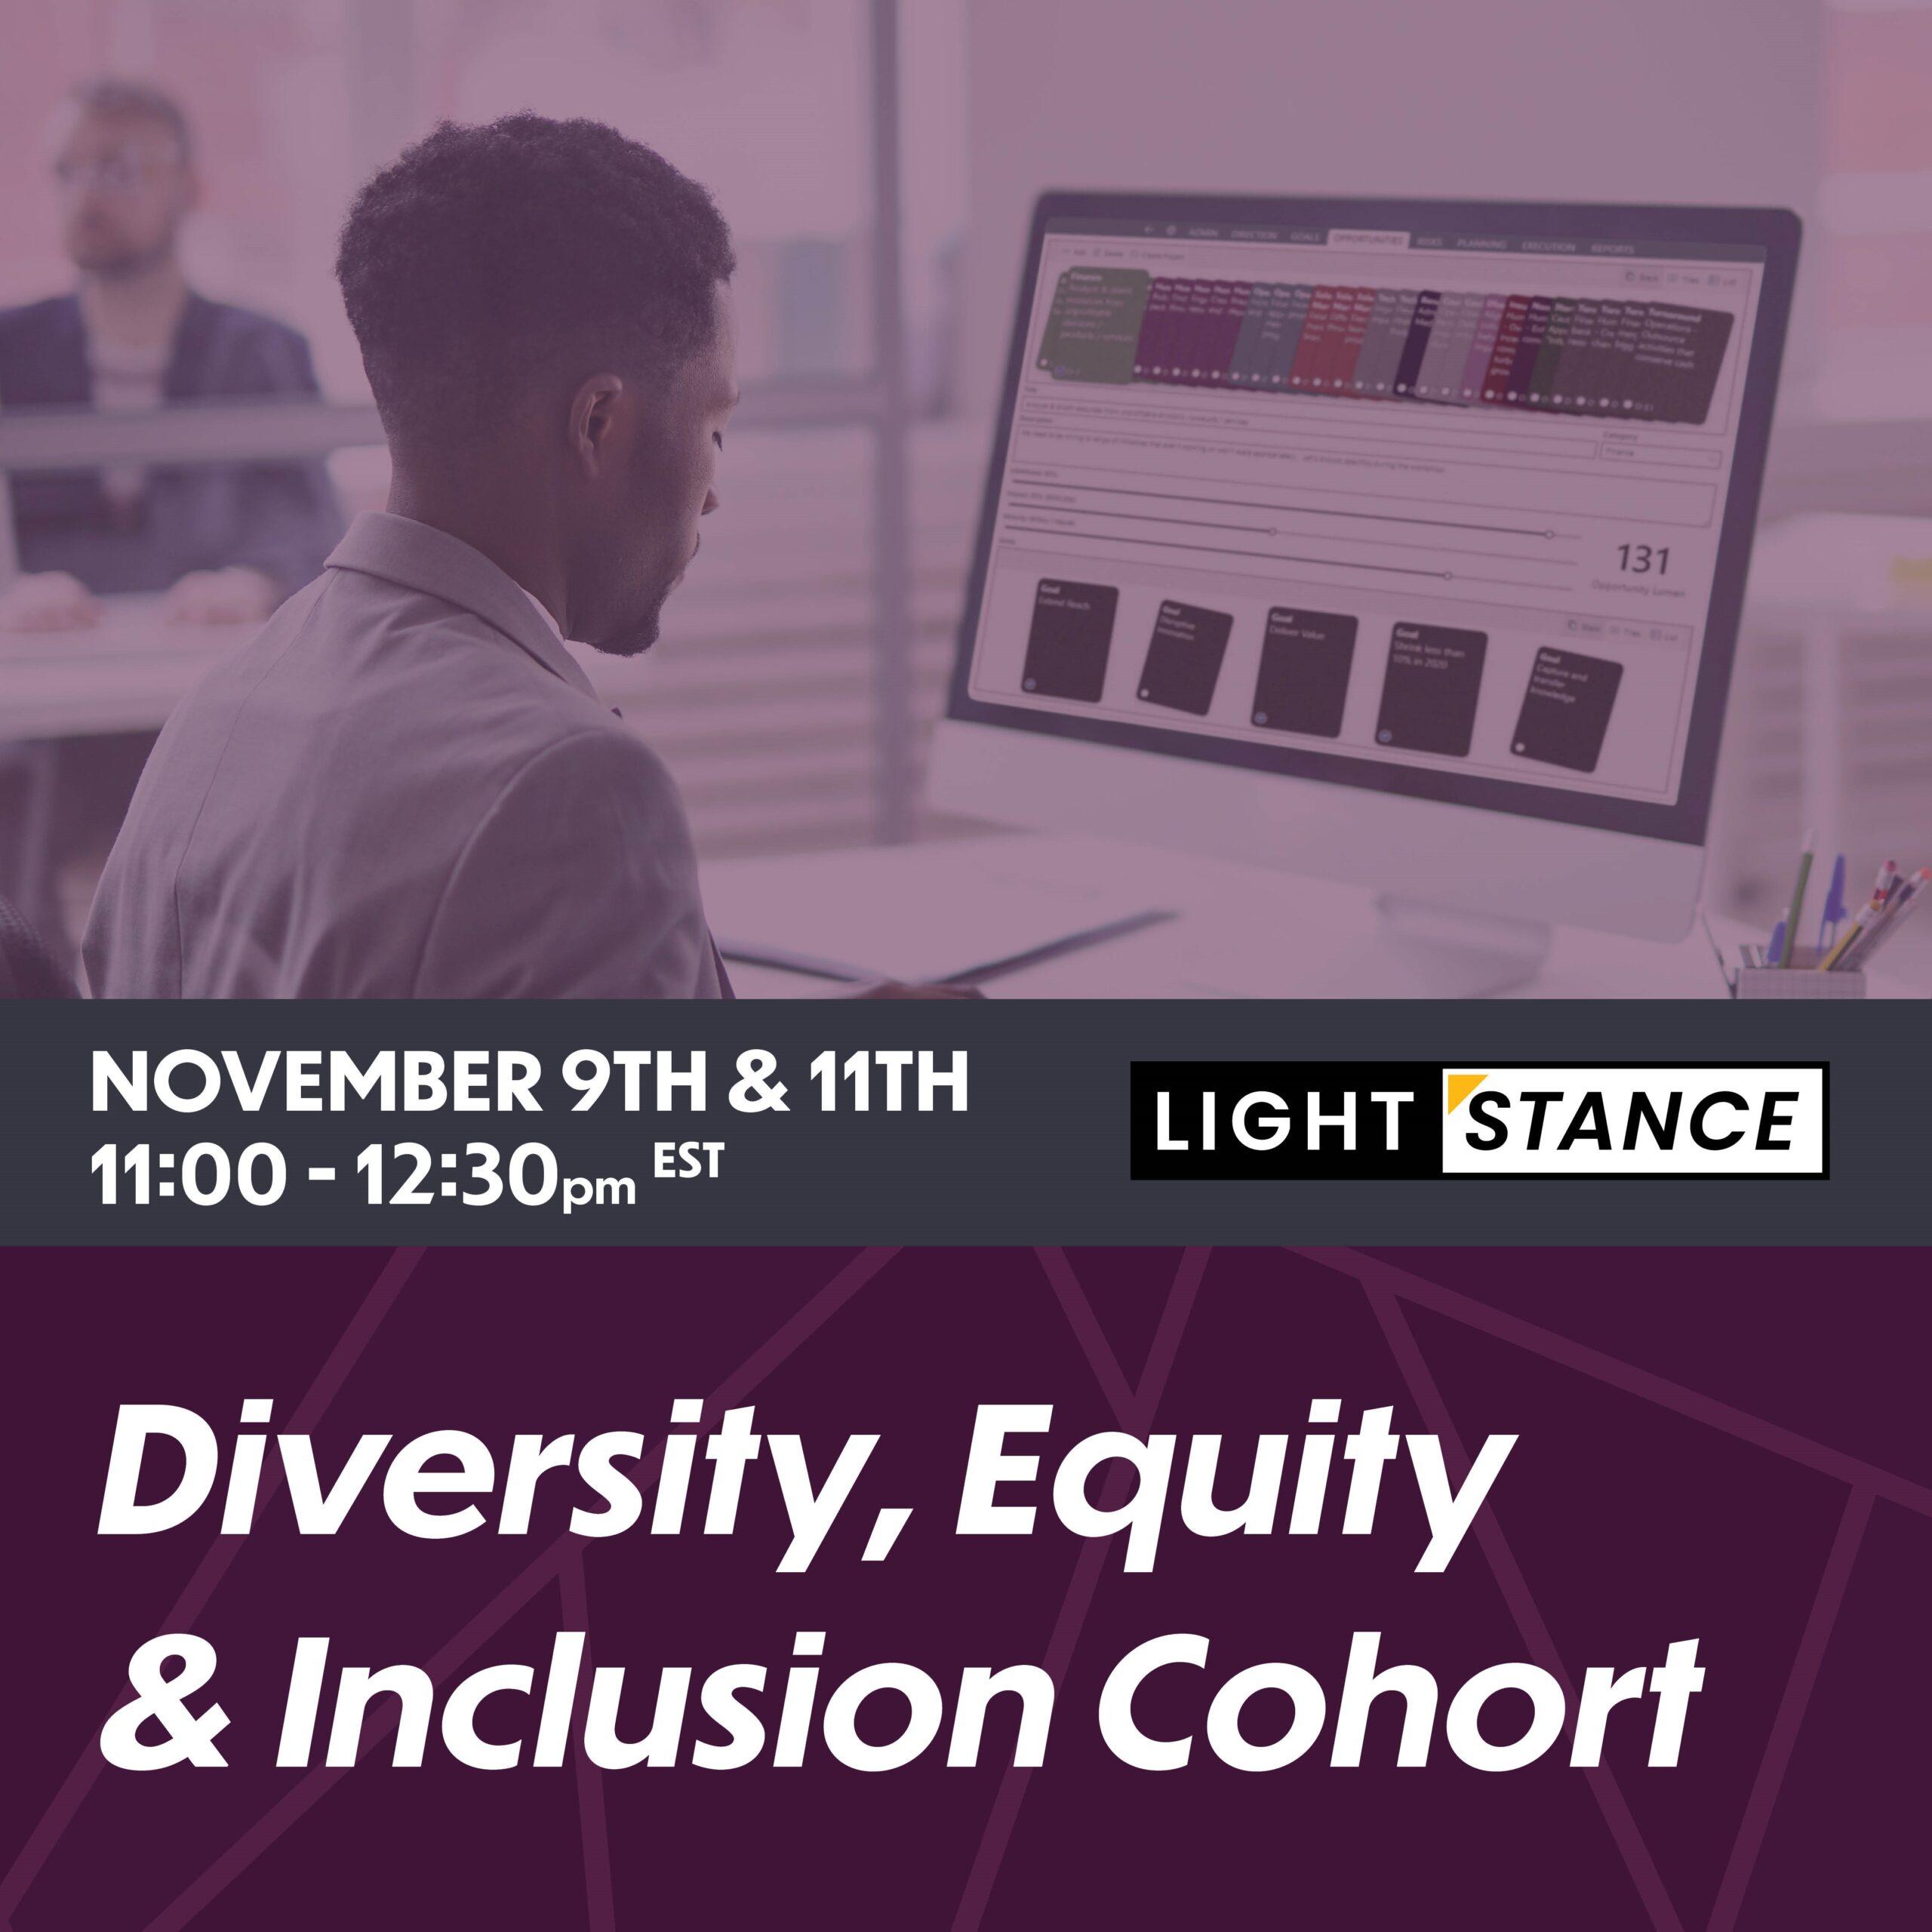 LightStance Diversity, Equity & Inclusion Cohort | November 2020